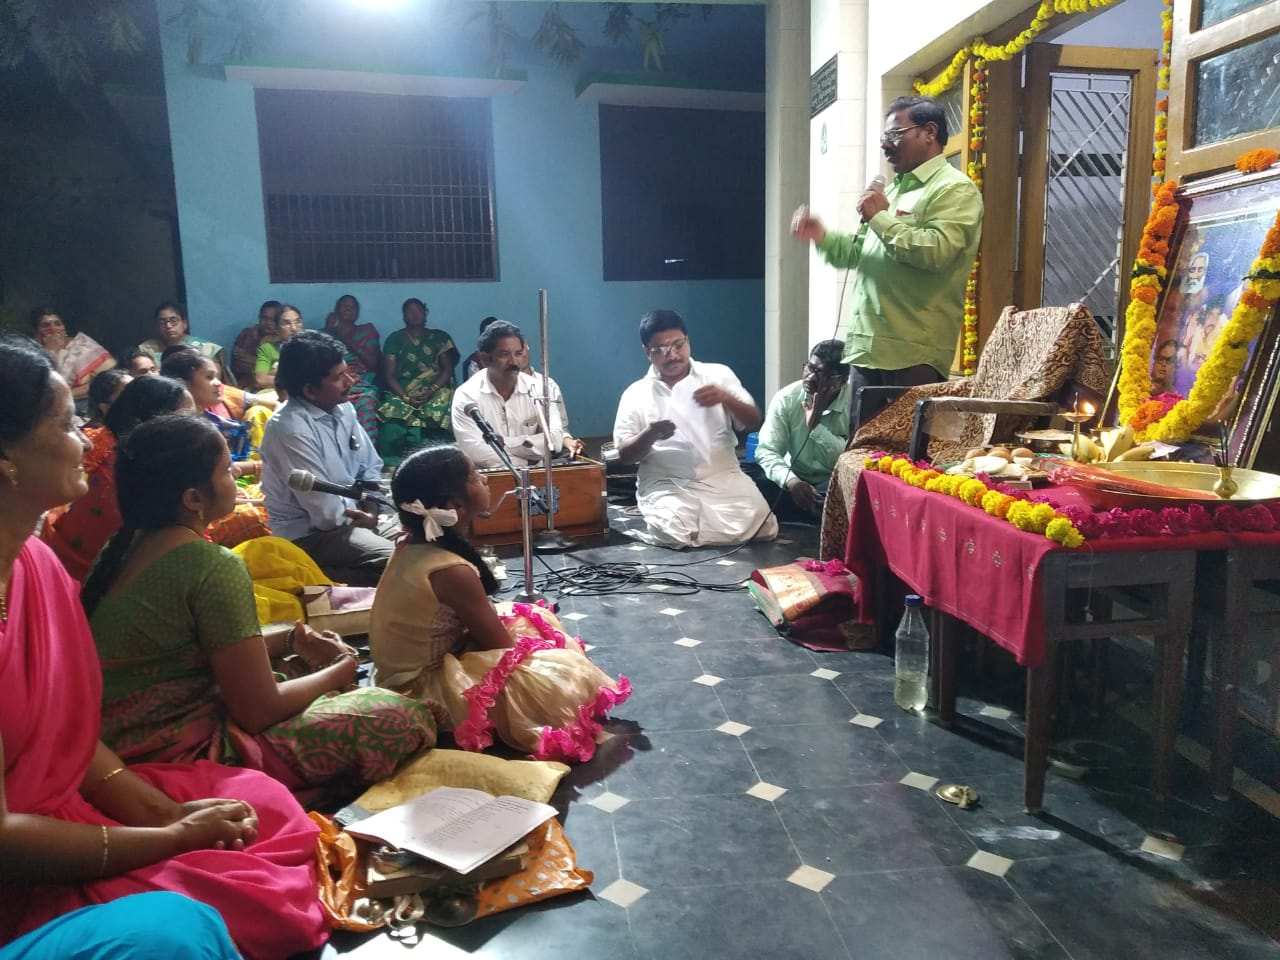 06-KarthikaMasam-Aaradhana-Aacchampeta-27112019